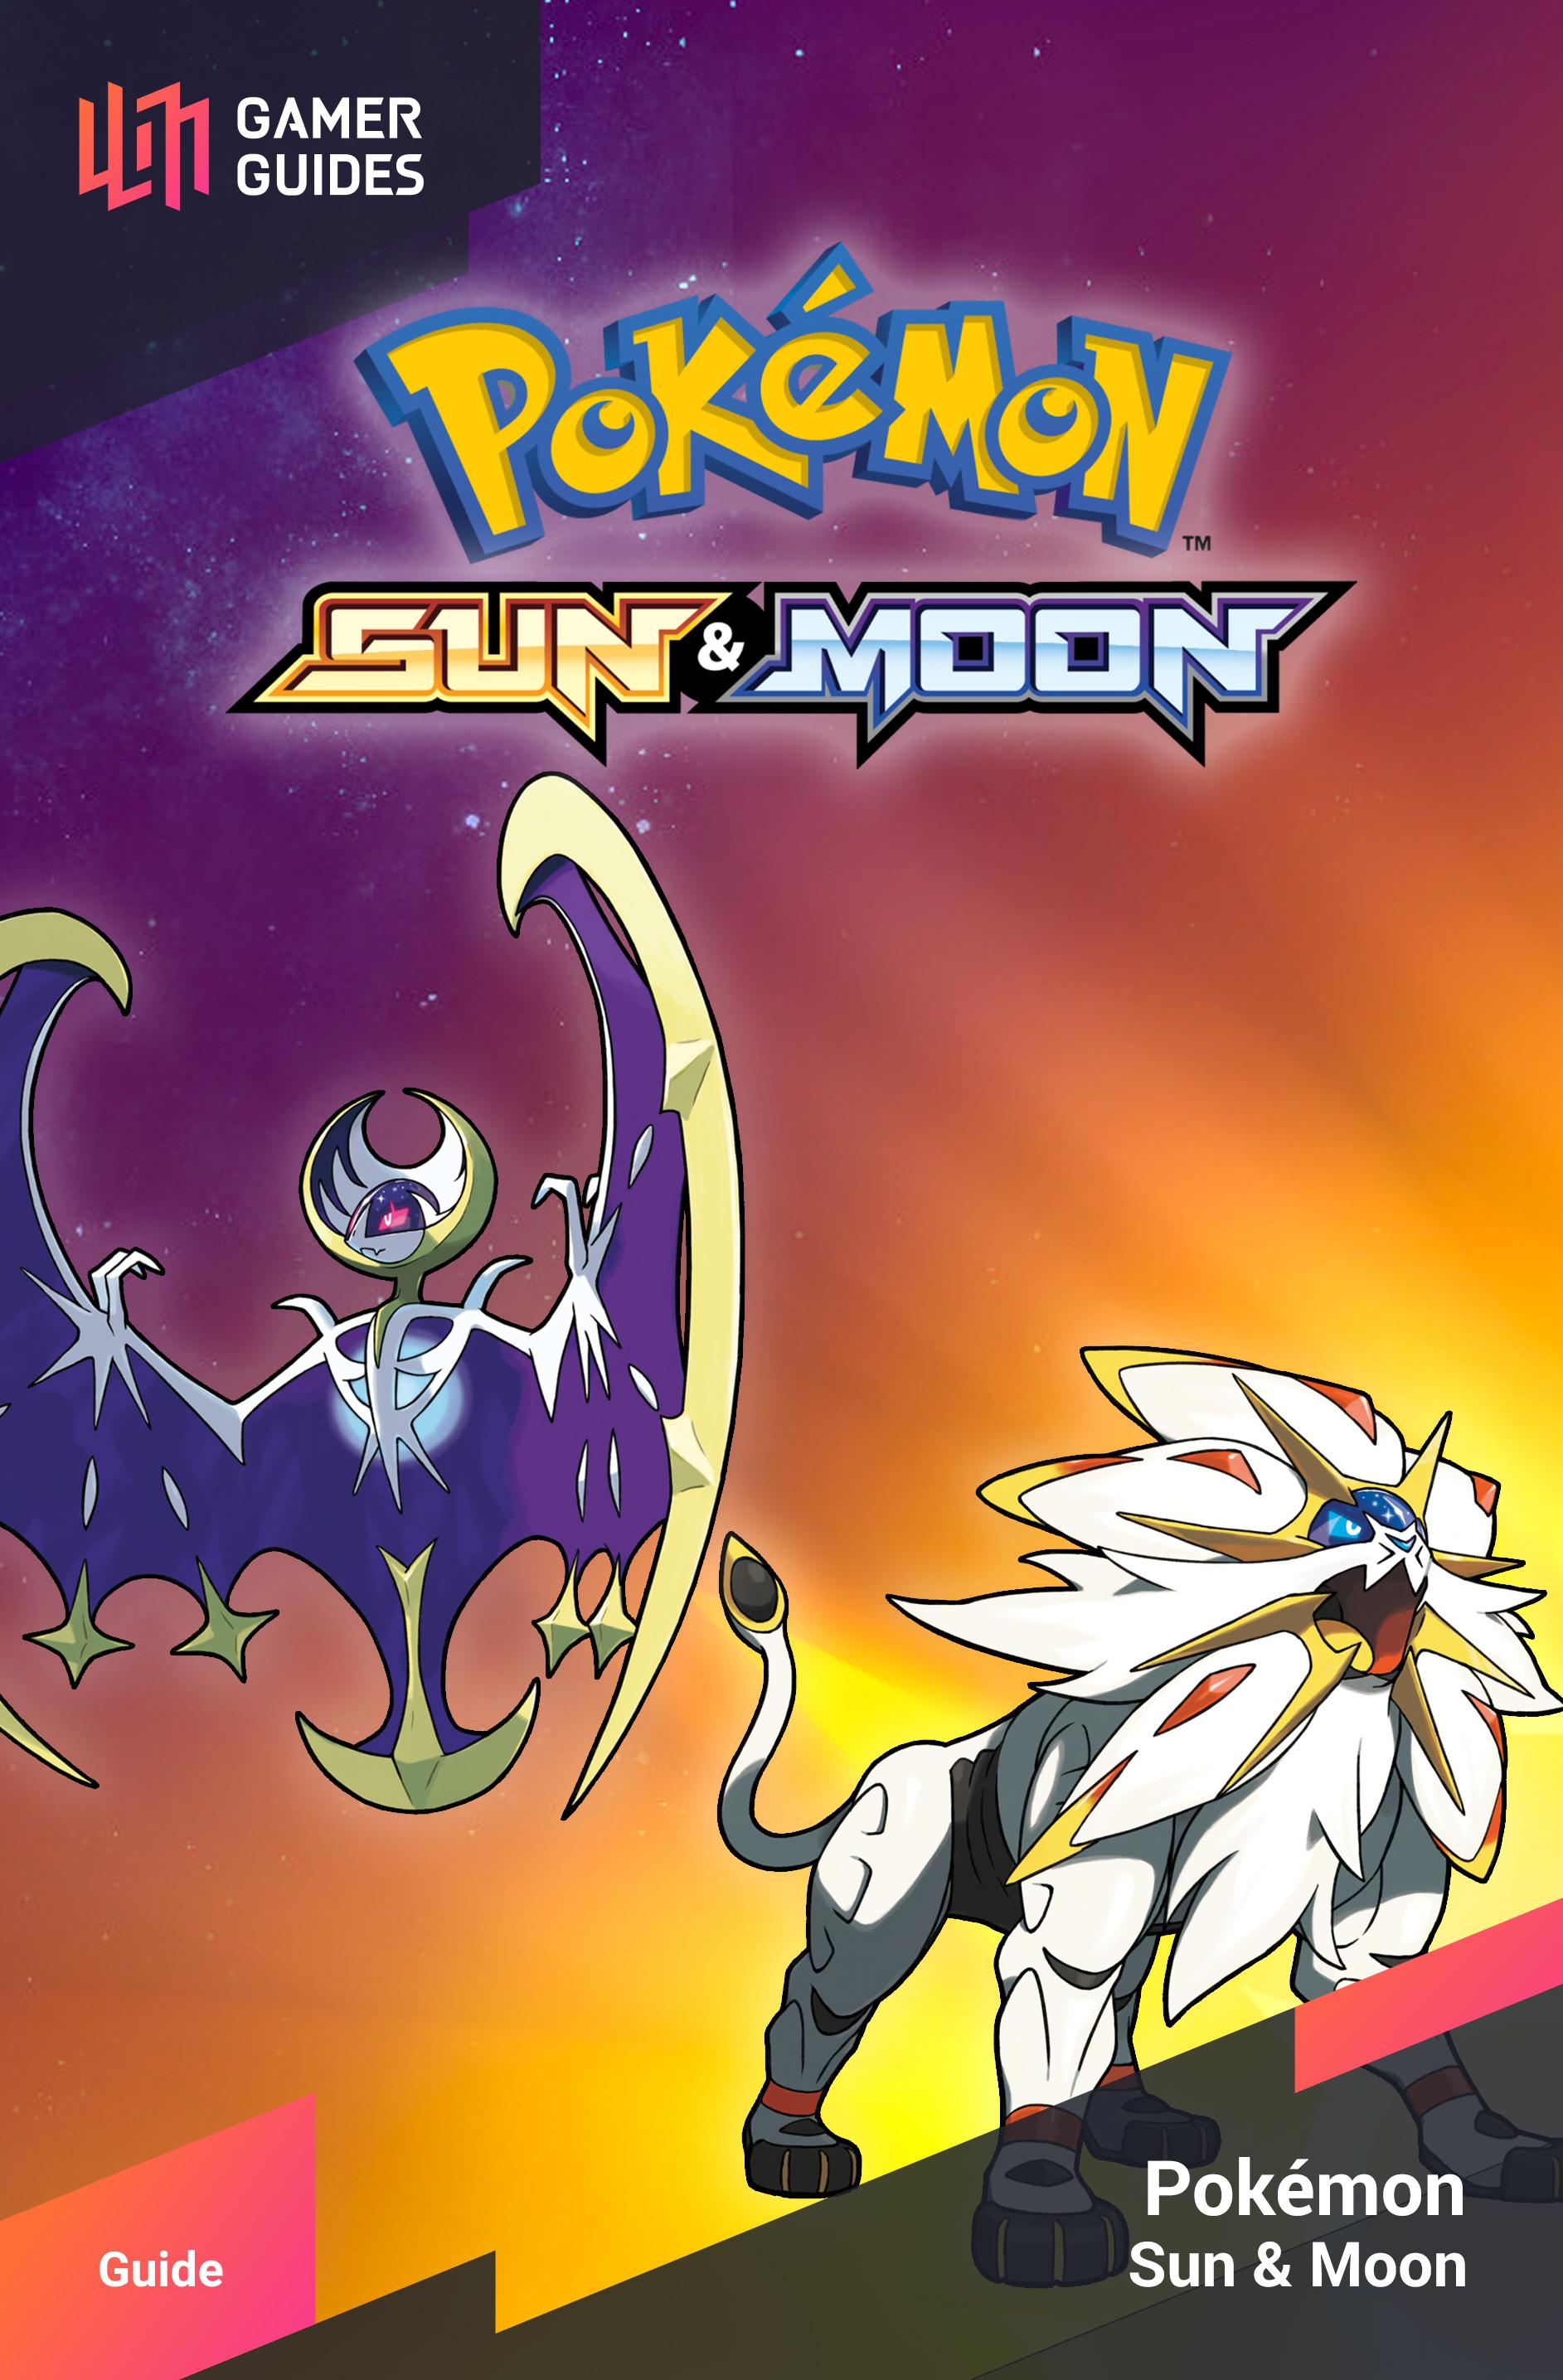 Pokémon Sun & Moon | Gamer Guides